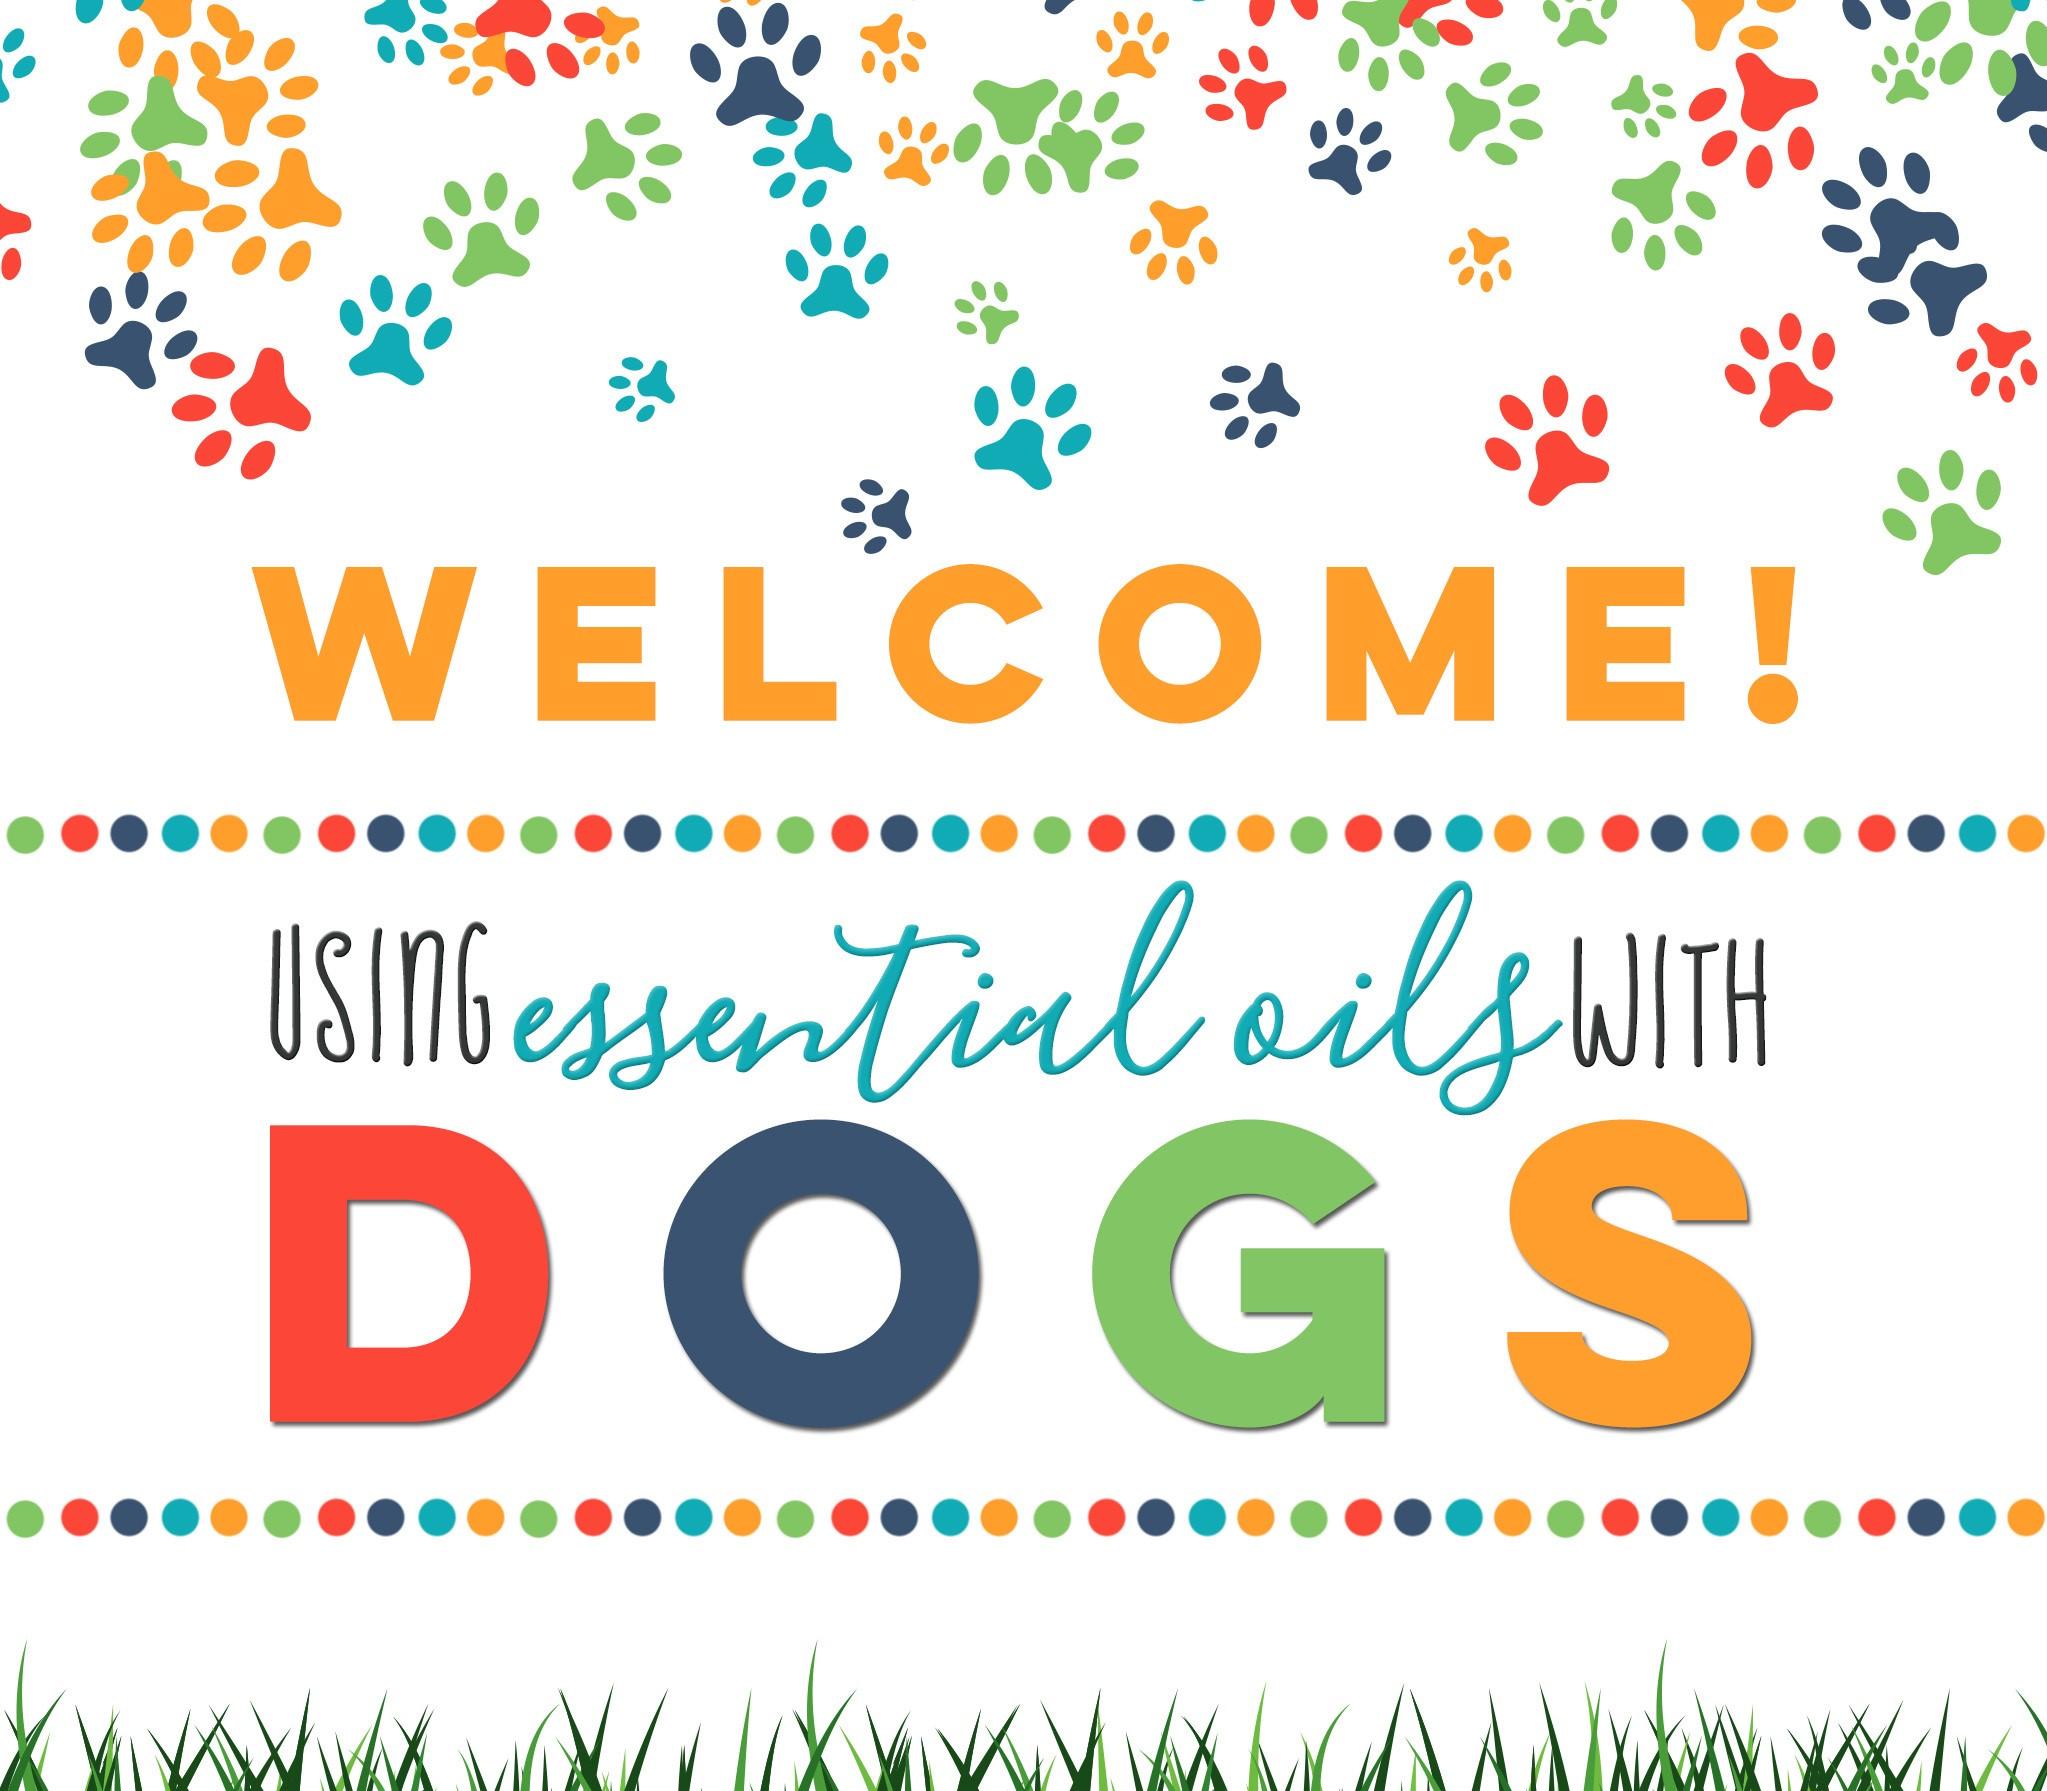 01-Dogs-Welcome.jpg